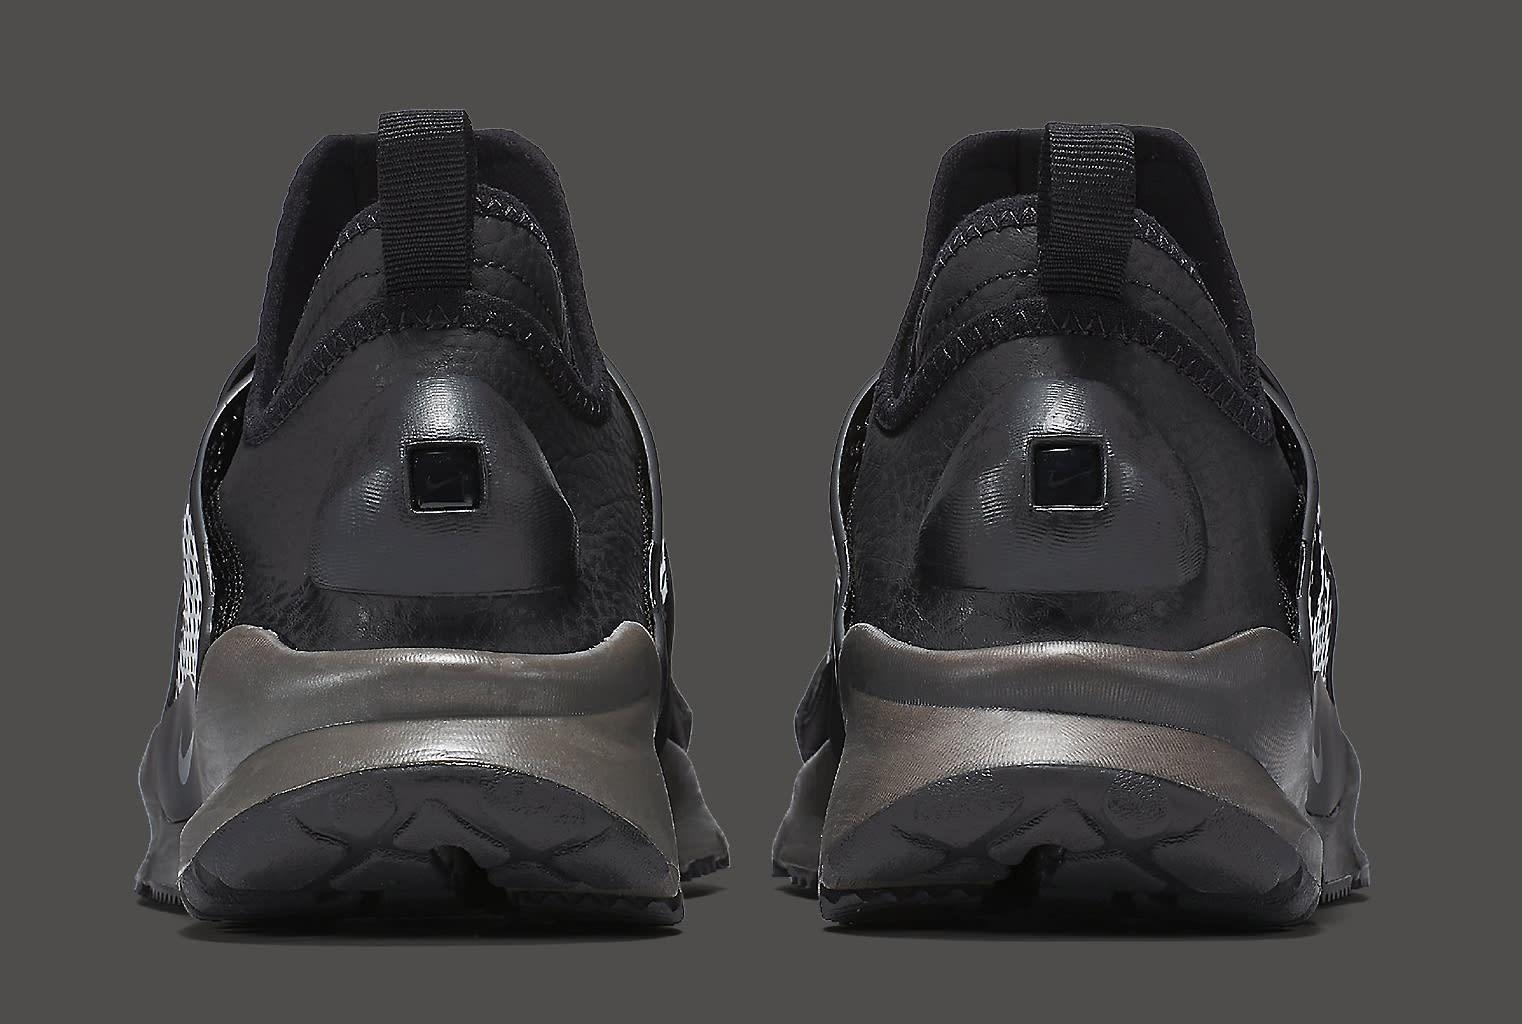 Stone Island Nike Sock Dart 910090-001 Heel